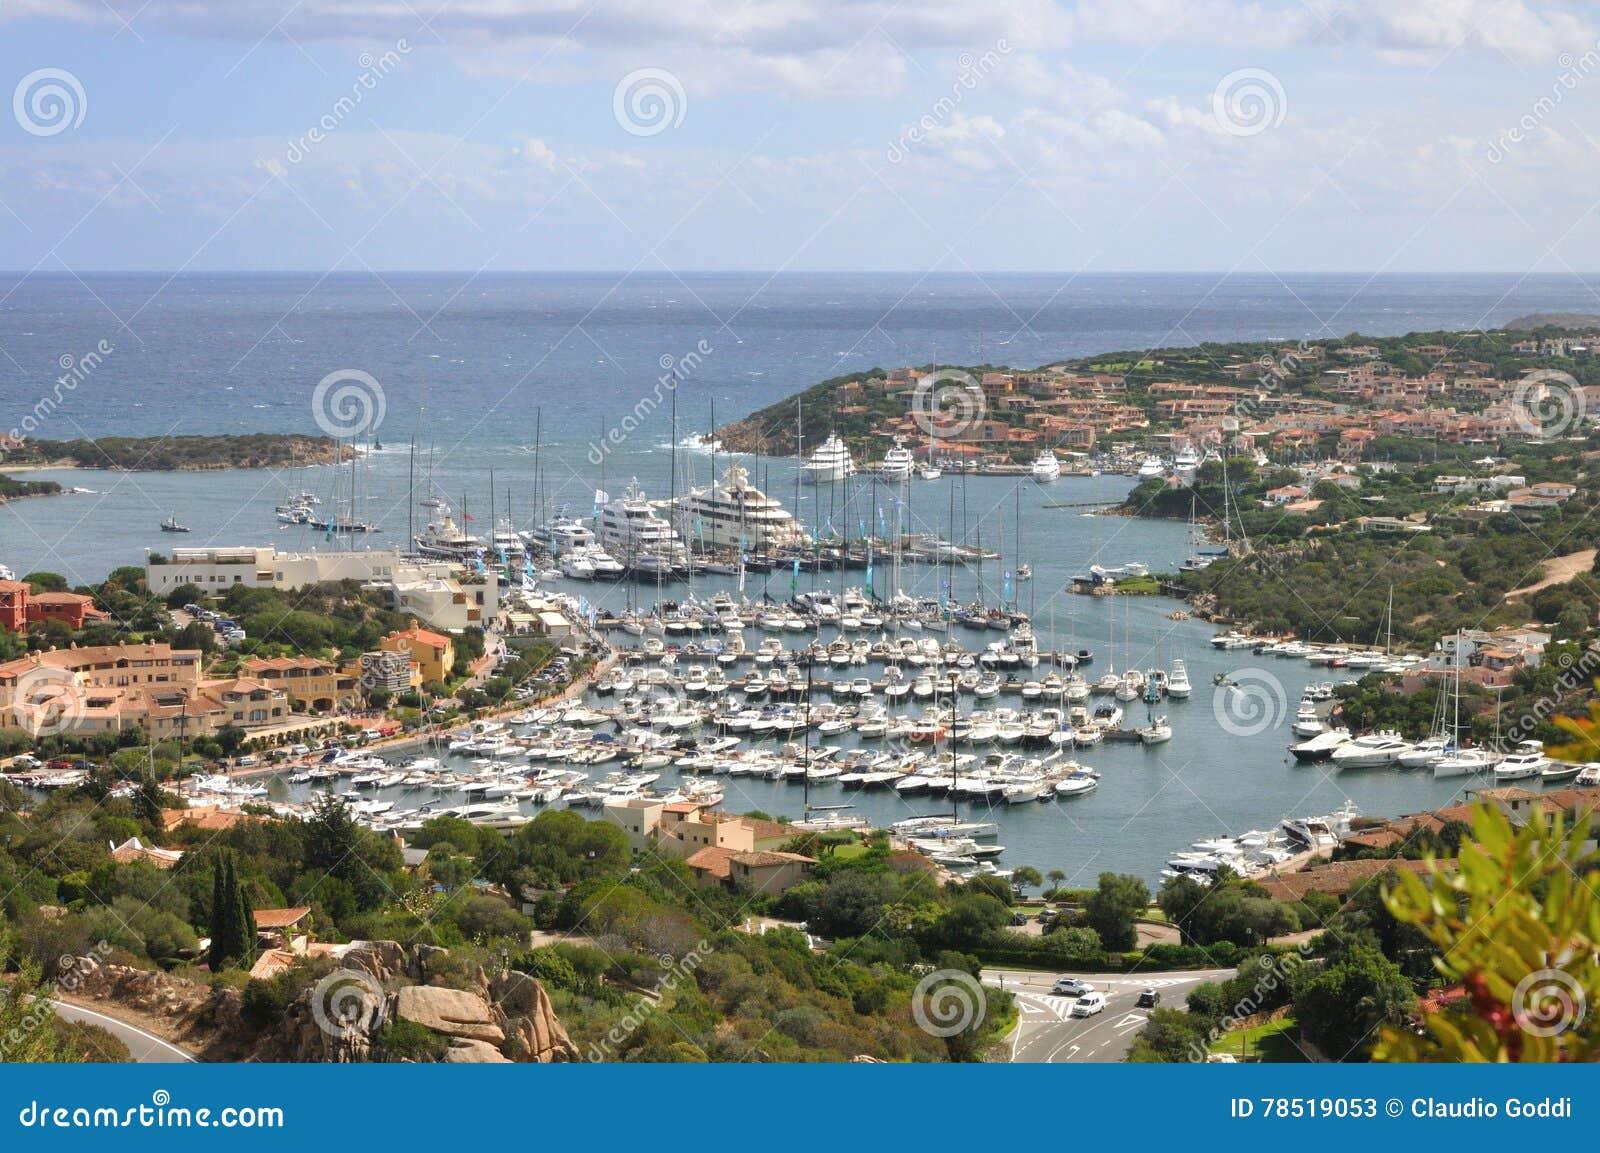 Porto Cervo stock image. Image of harbor, dock, costa ...